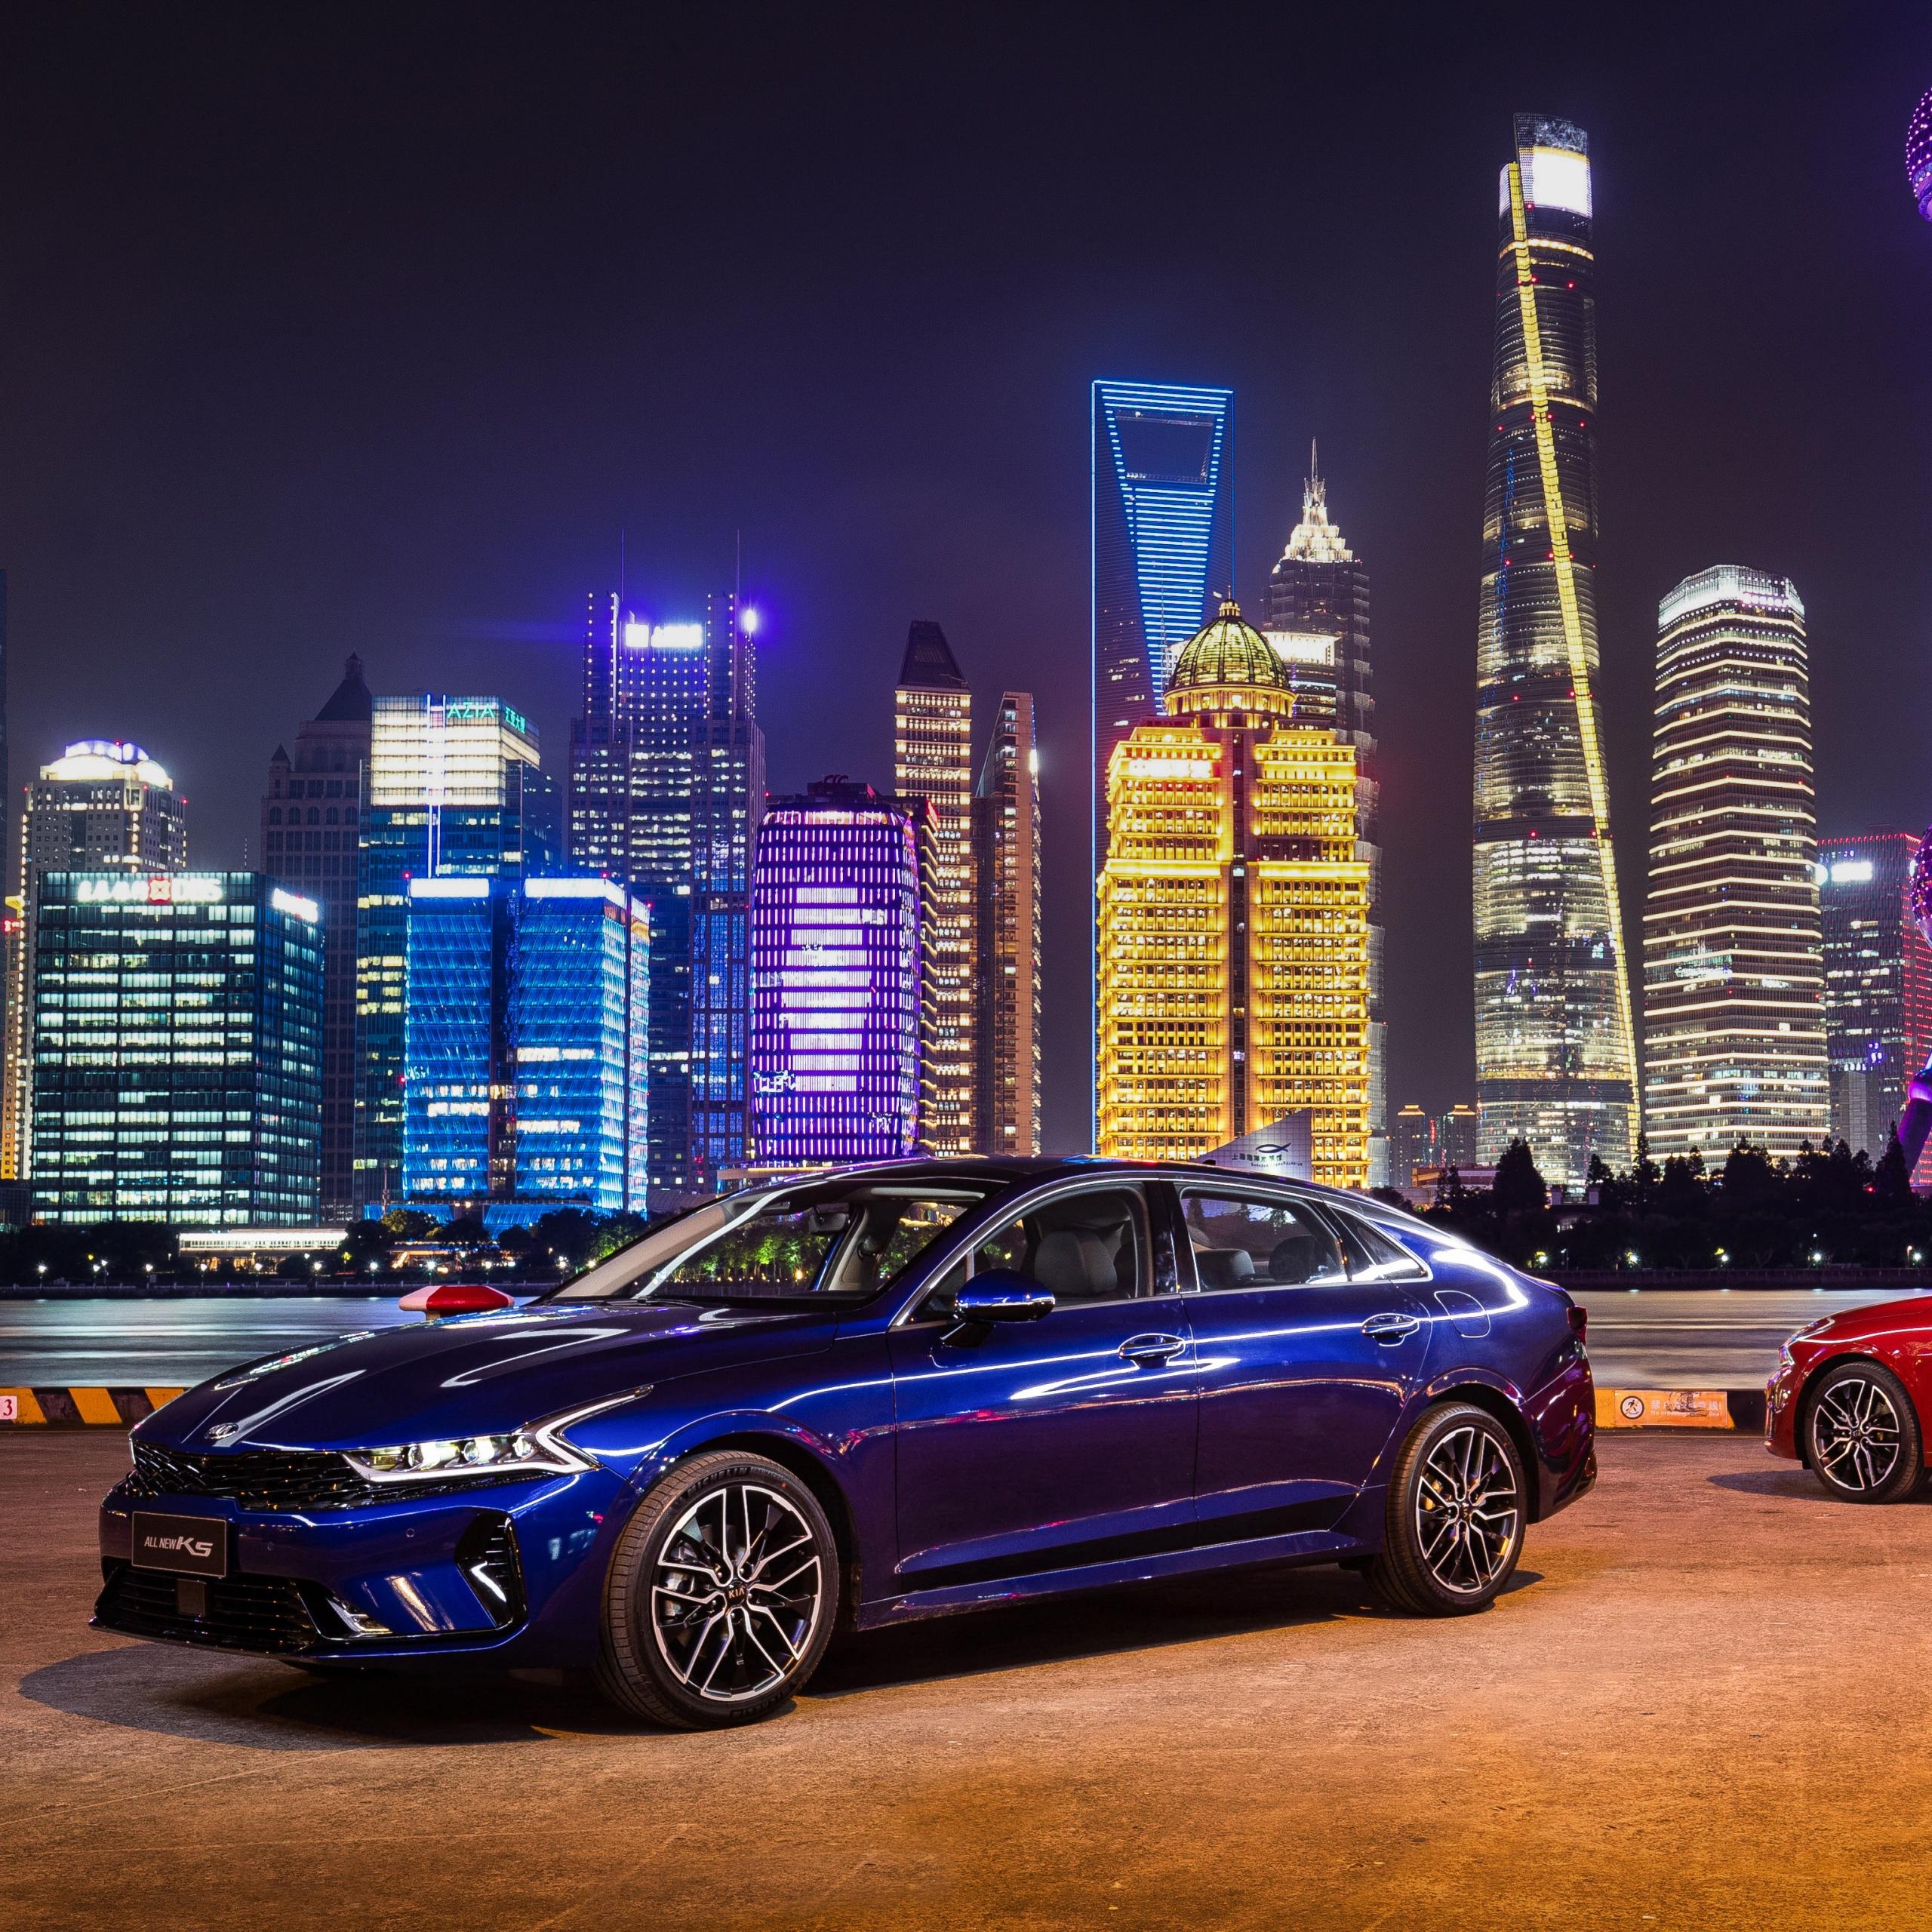 Kia K5 GT-Line 4K Wallpaper, Shanghai, Cityscape, Night